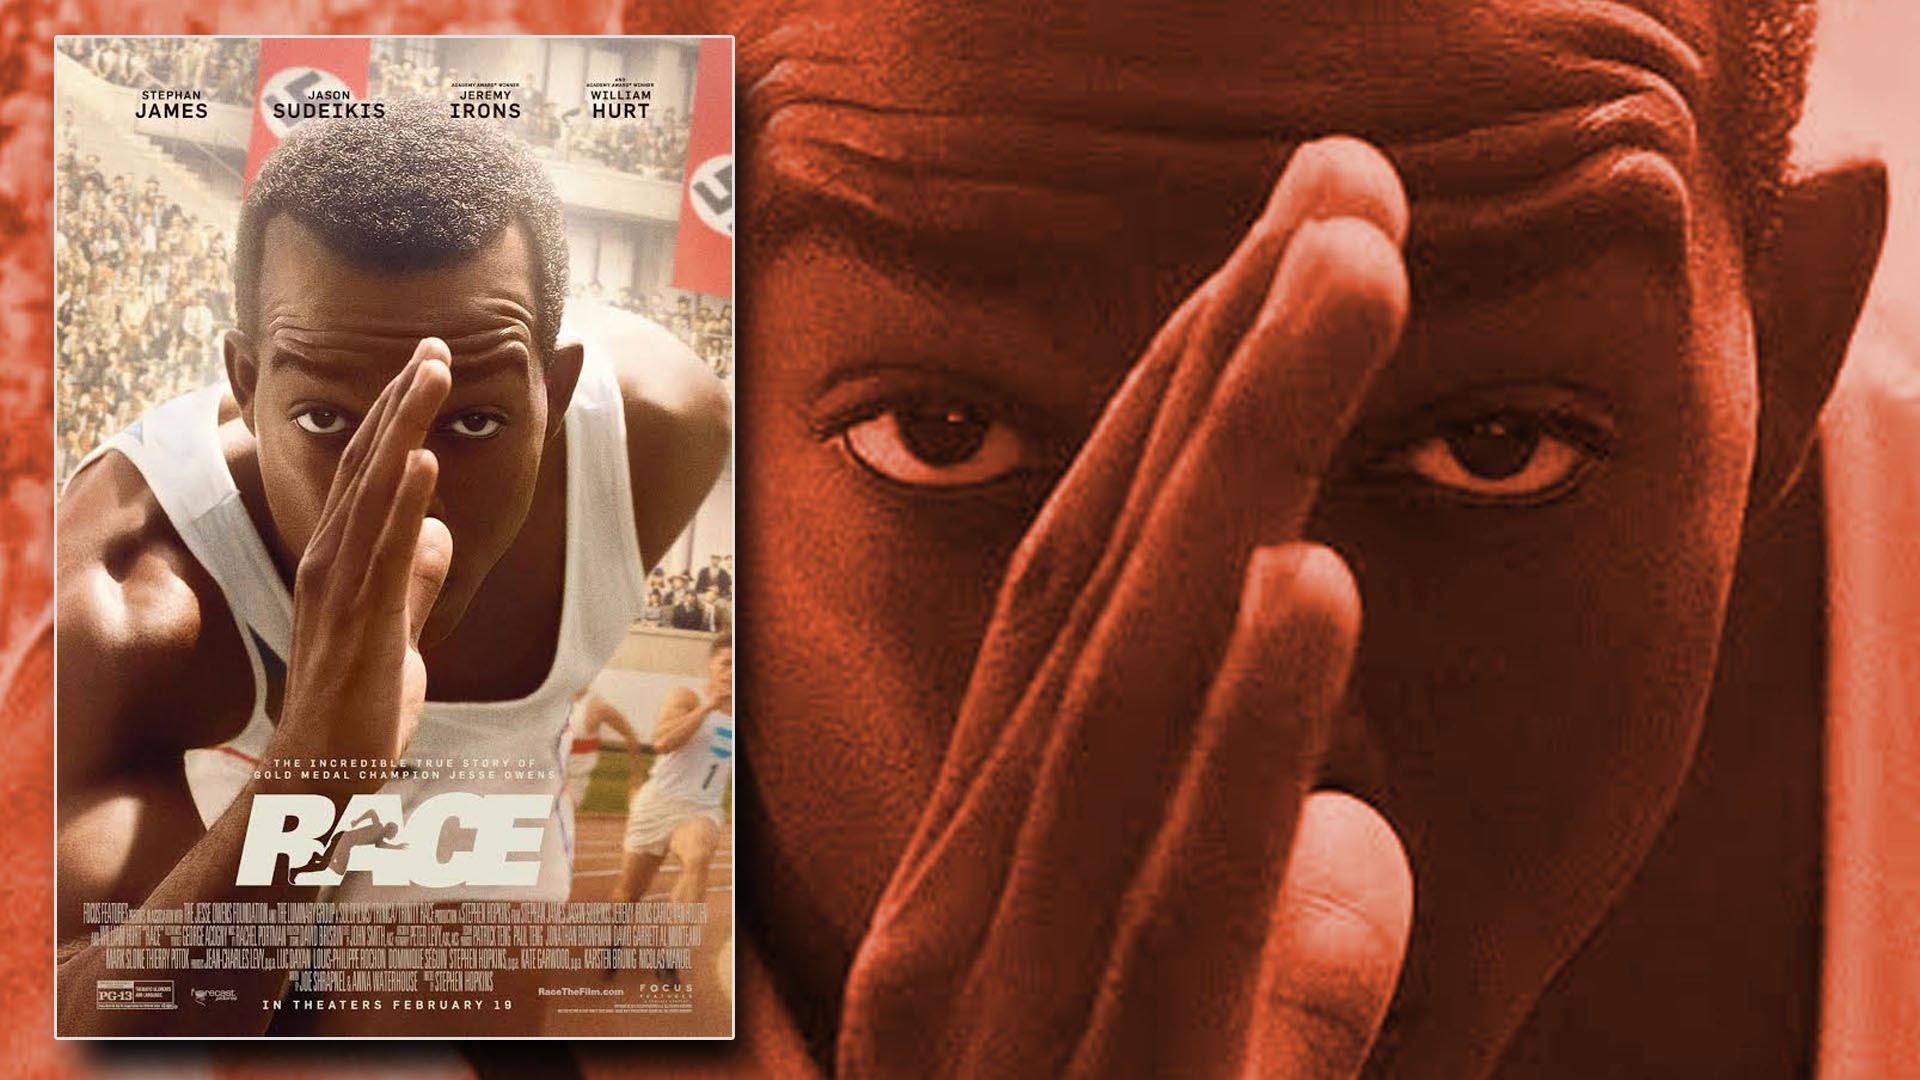 La storia di Jesse Owens arriva al cinema